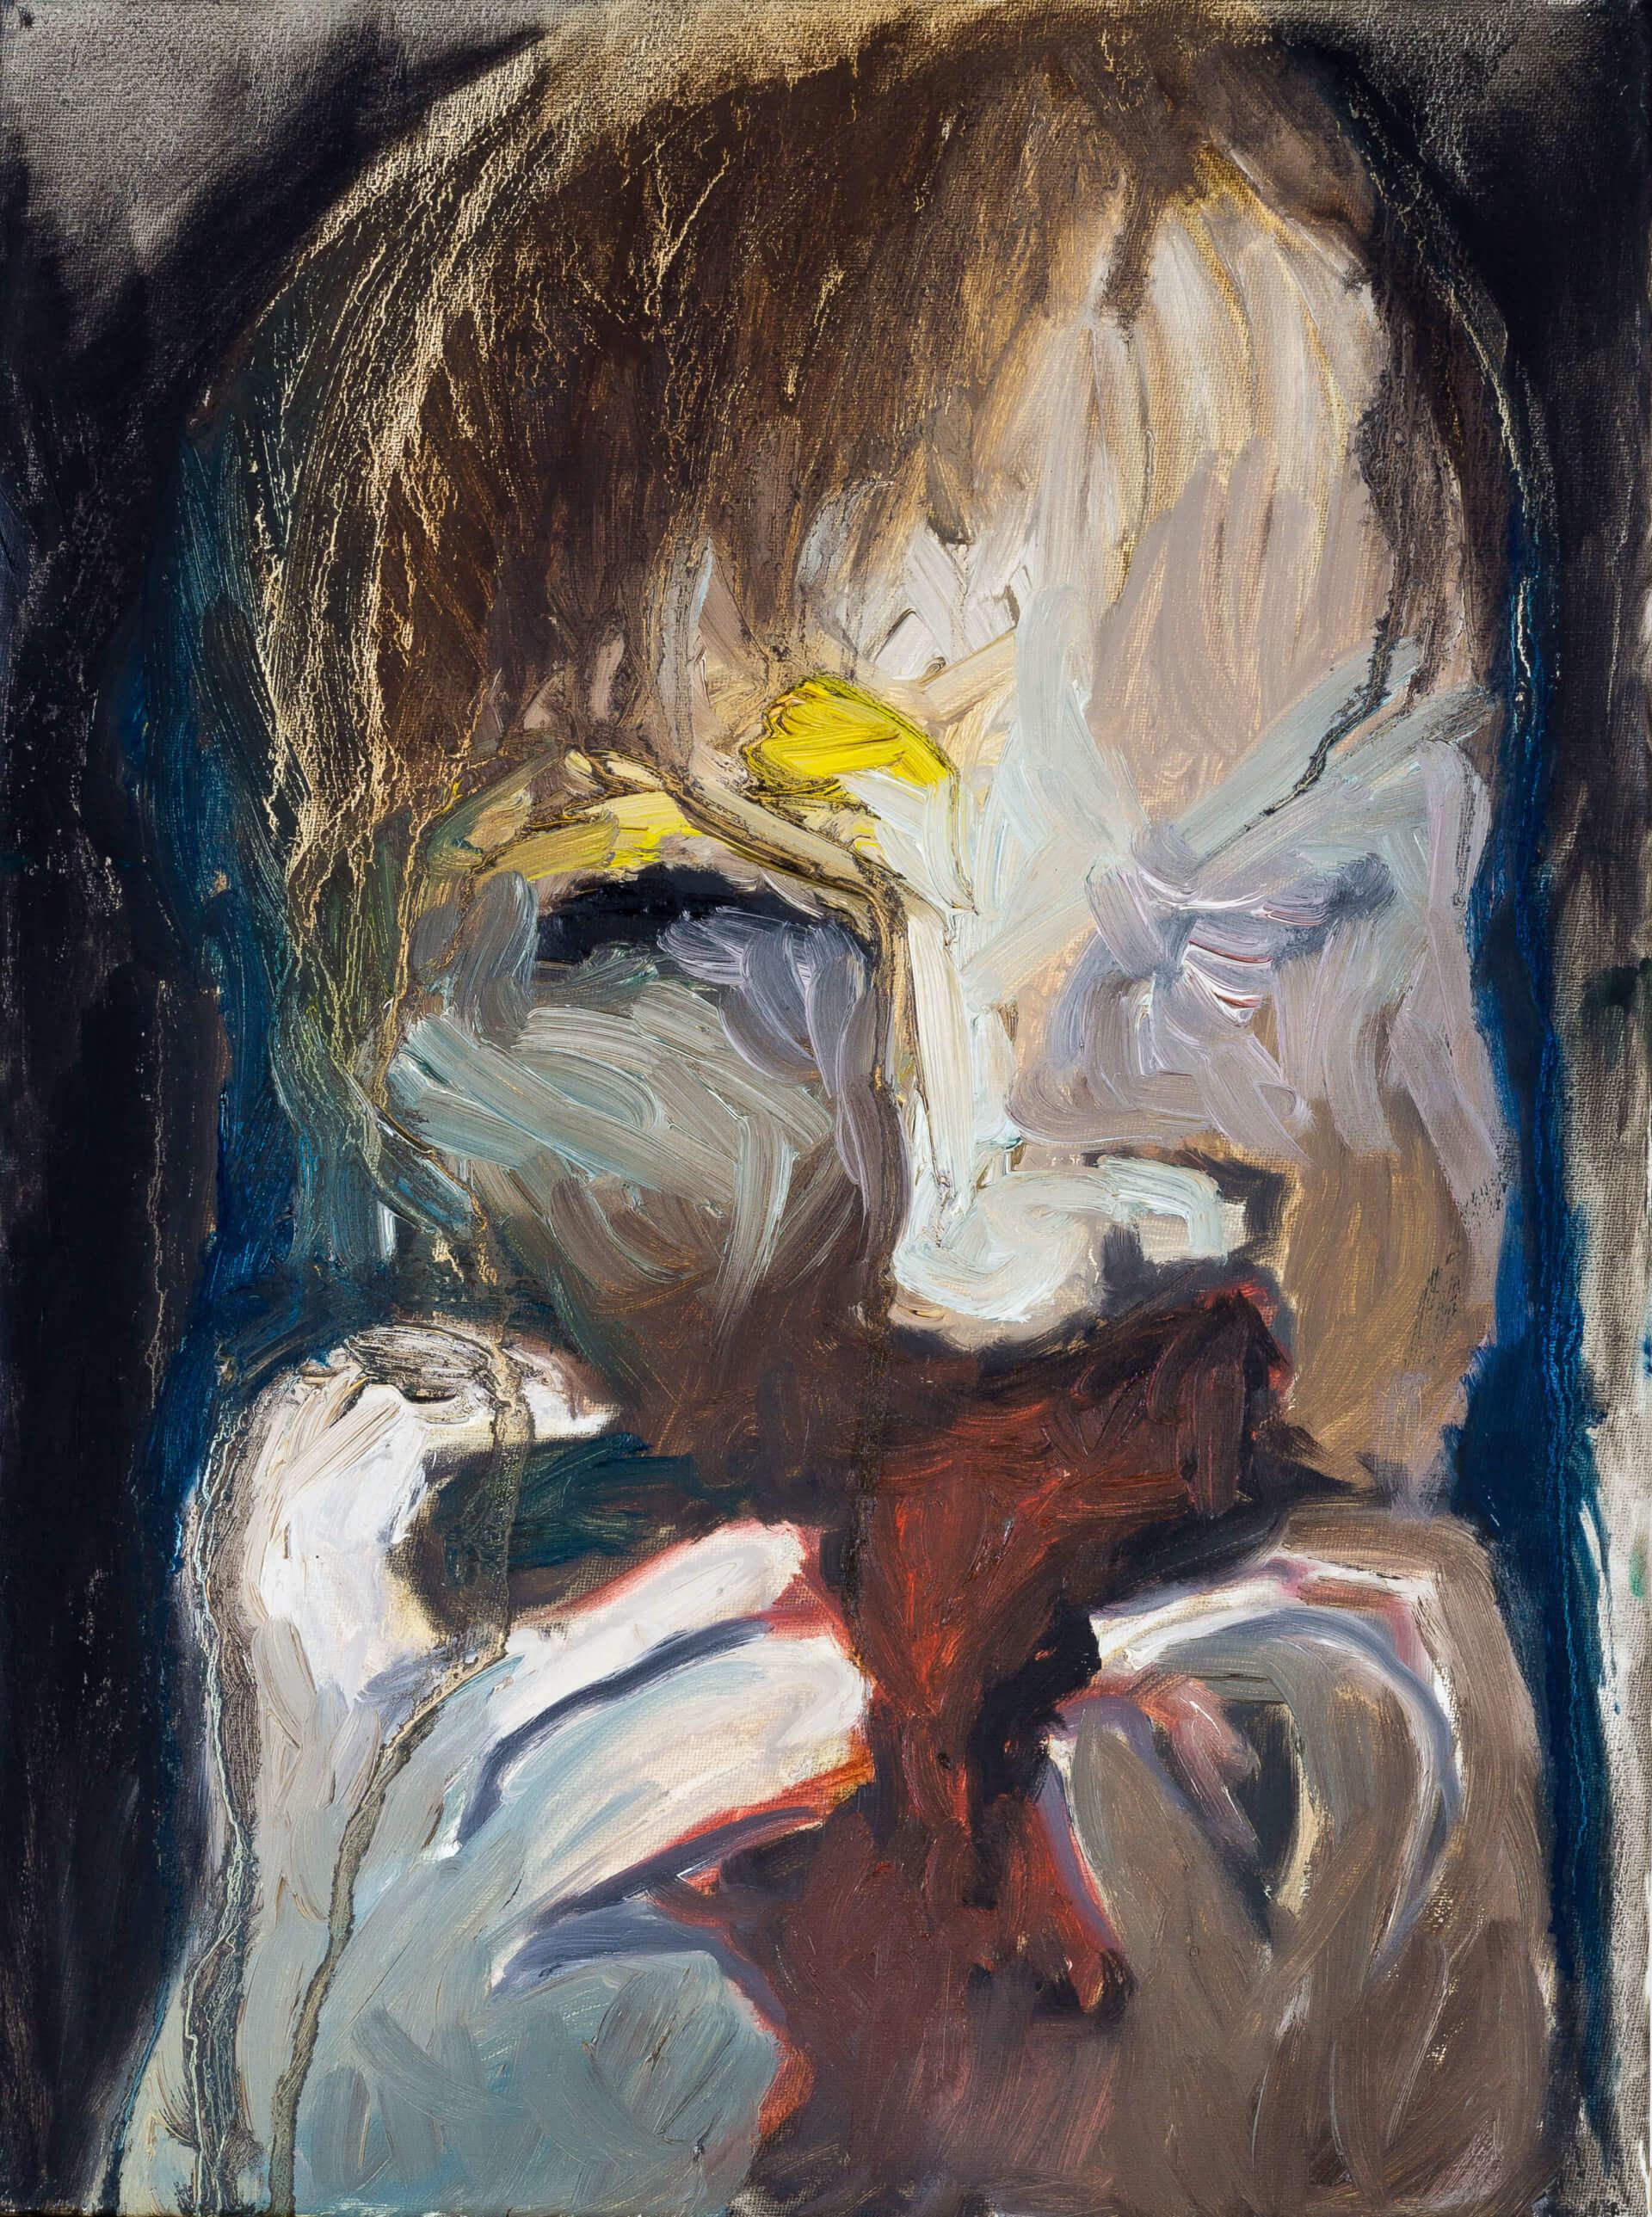 Katharina Albers, Transformation XXII, 2011, Öl auf Leinwand, 40×30 cm